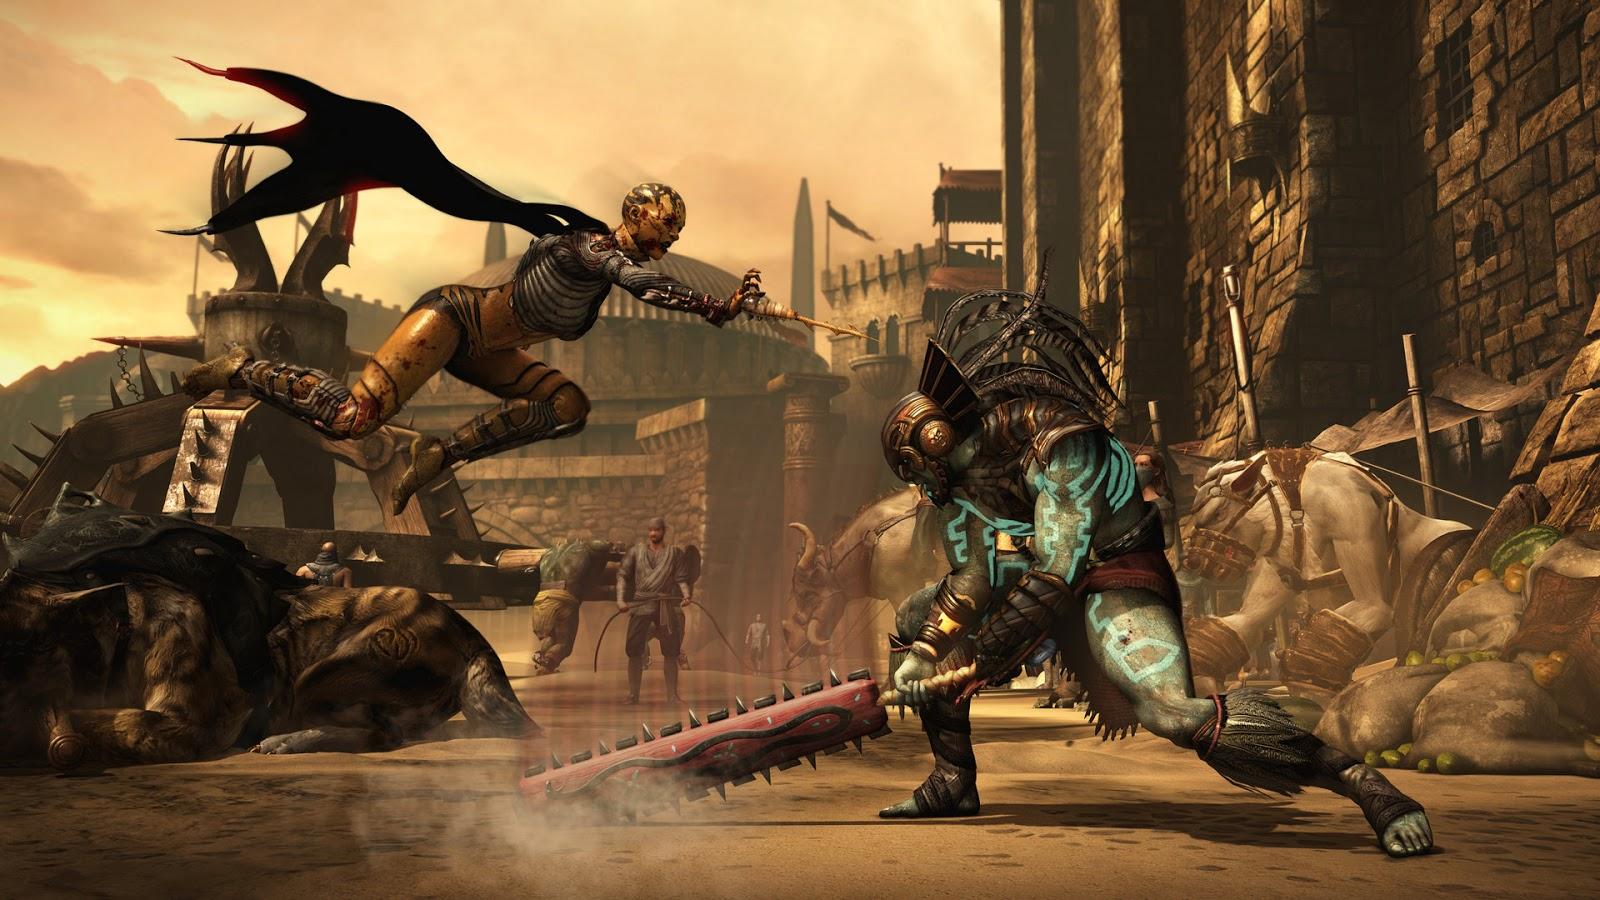 Mortal Kombat 11 welcomes back demi-god Rain with Kombat